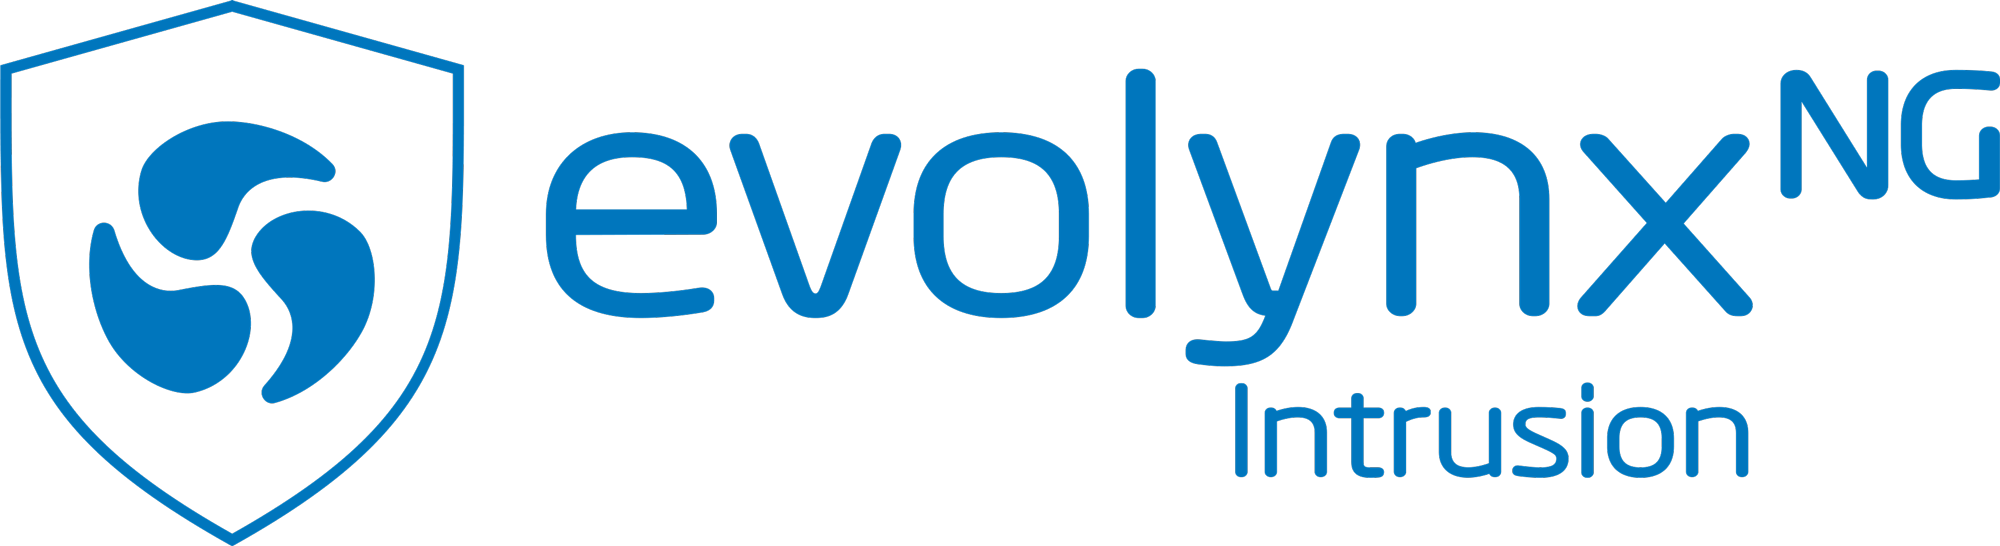 logo evolynxNG software intrusion